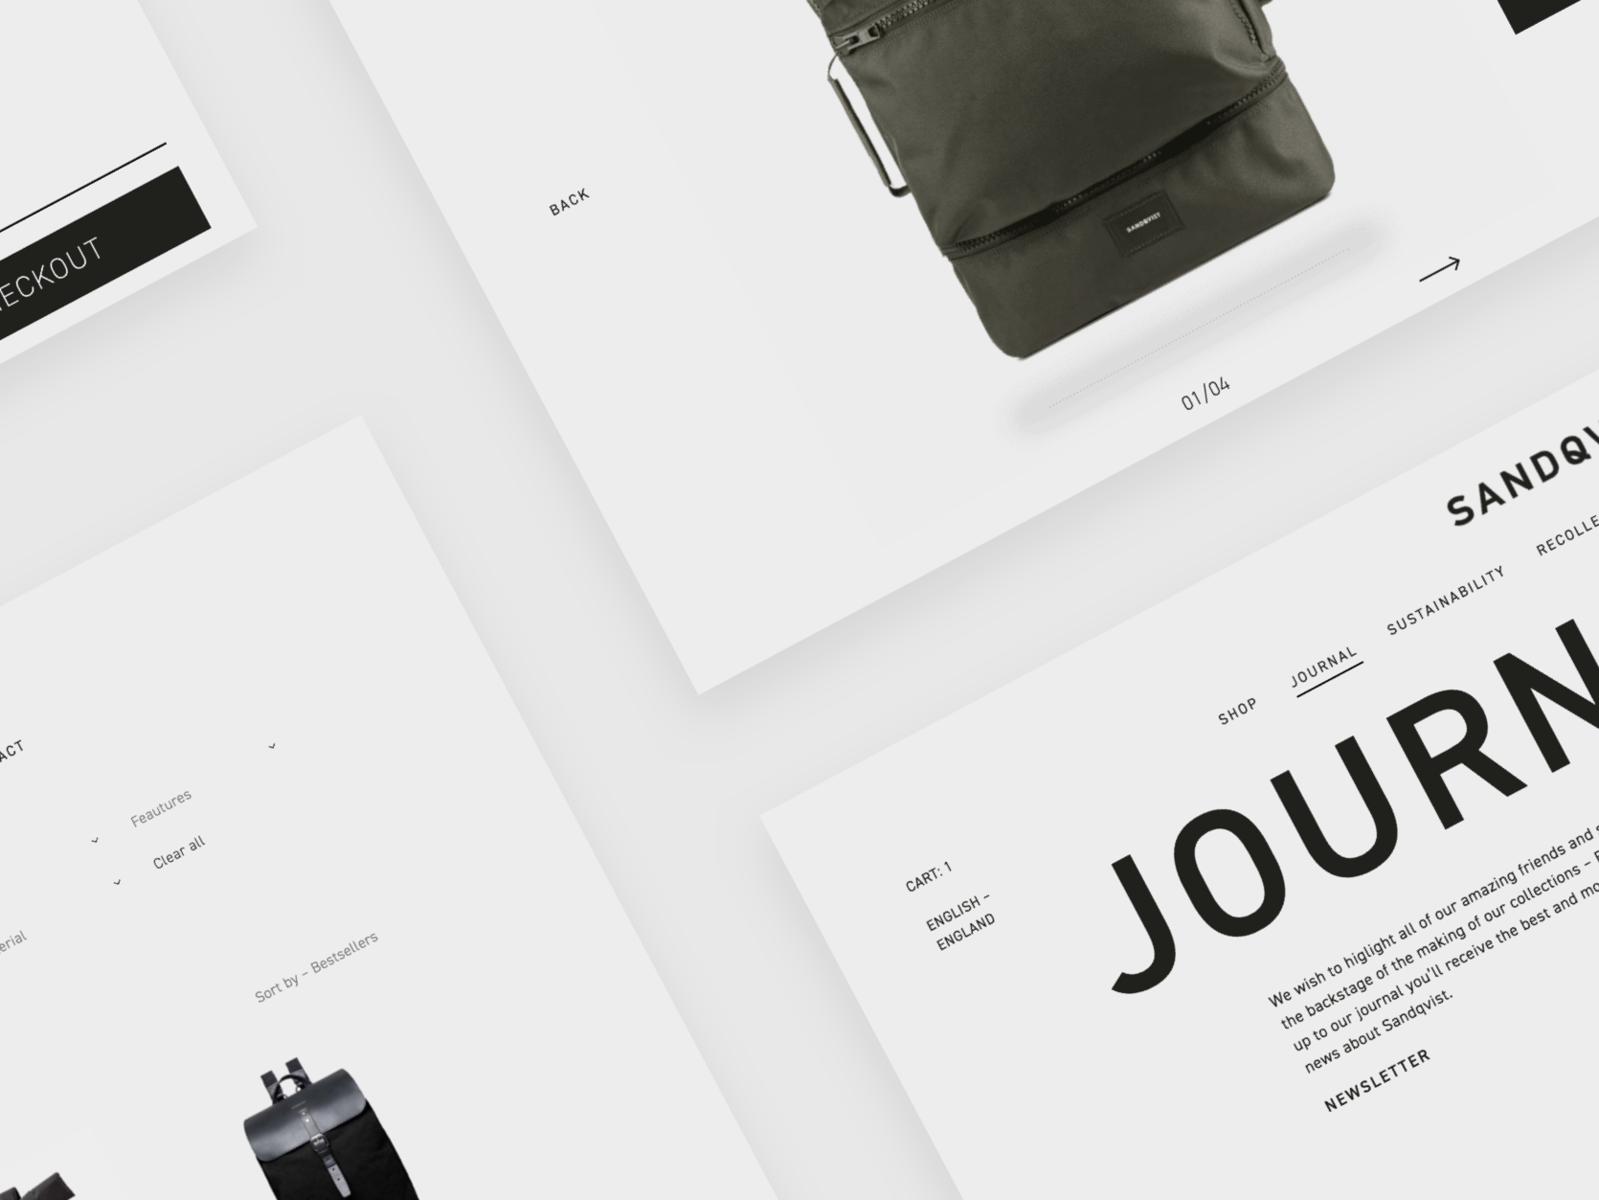 Web Design Concept and Prototype for Sandqvist webshop webflow web ui sweden scandinavian redesign nordic minimalist backpacks